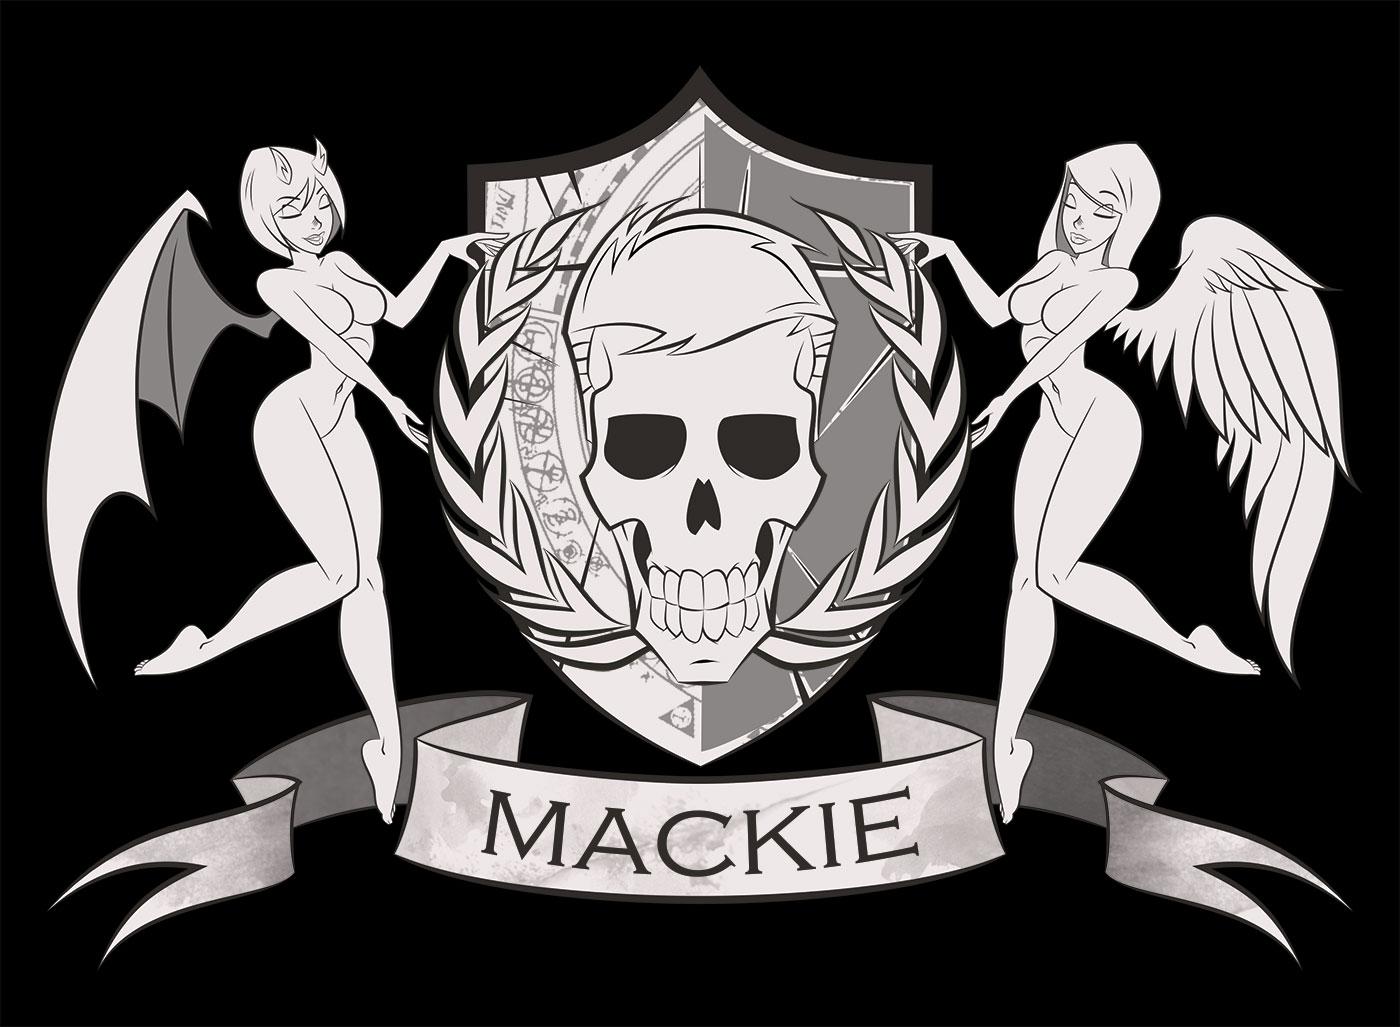 Mackie Crest